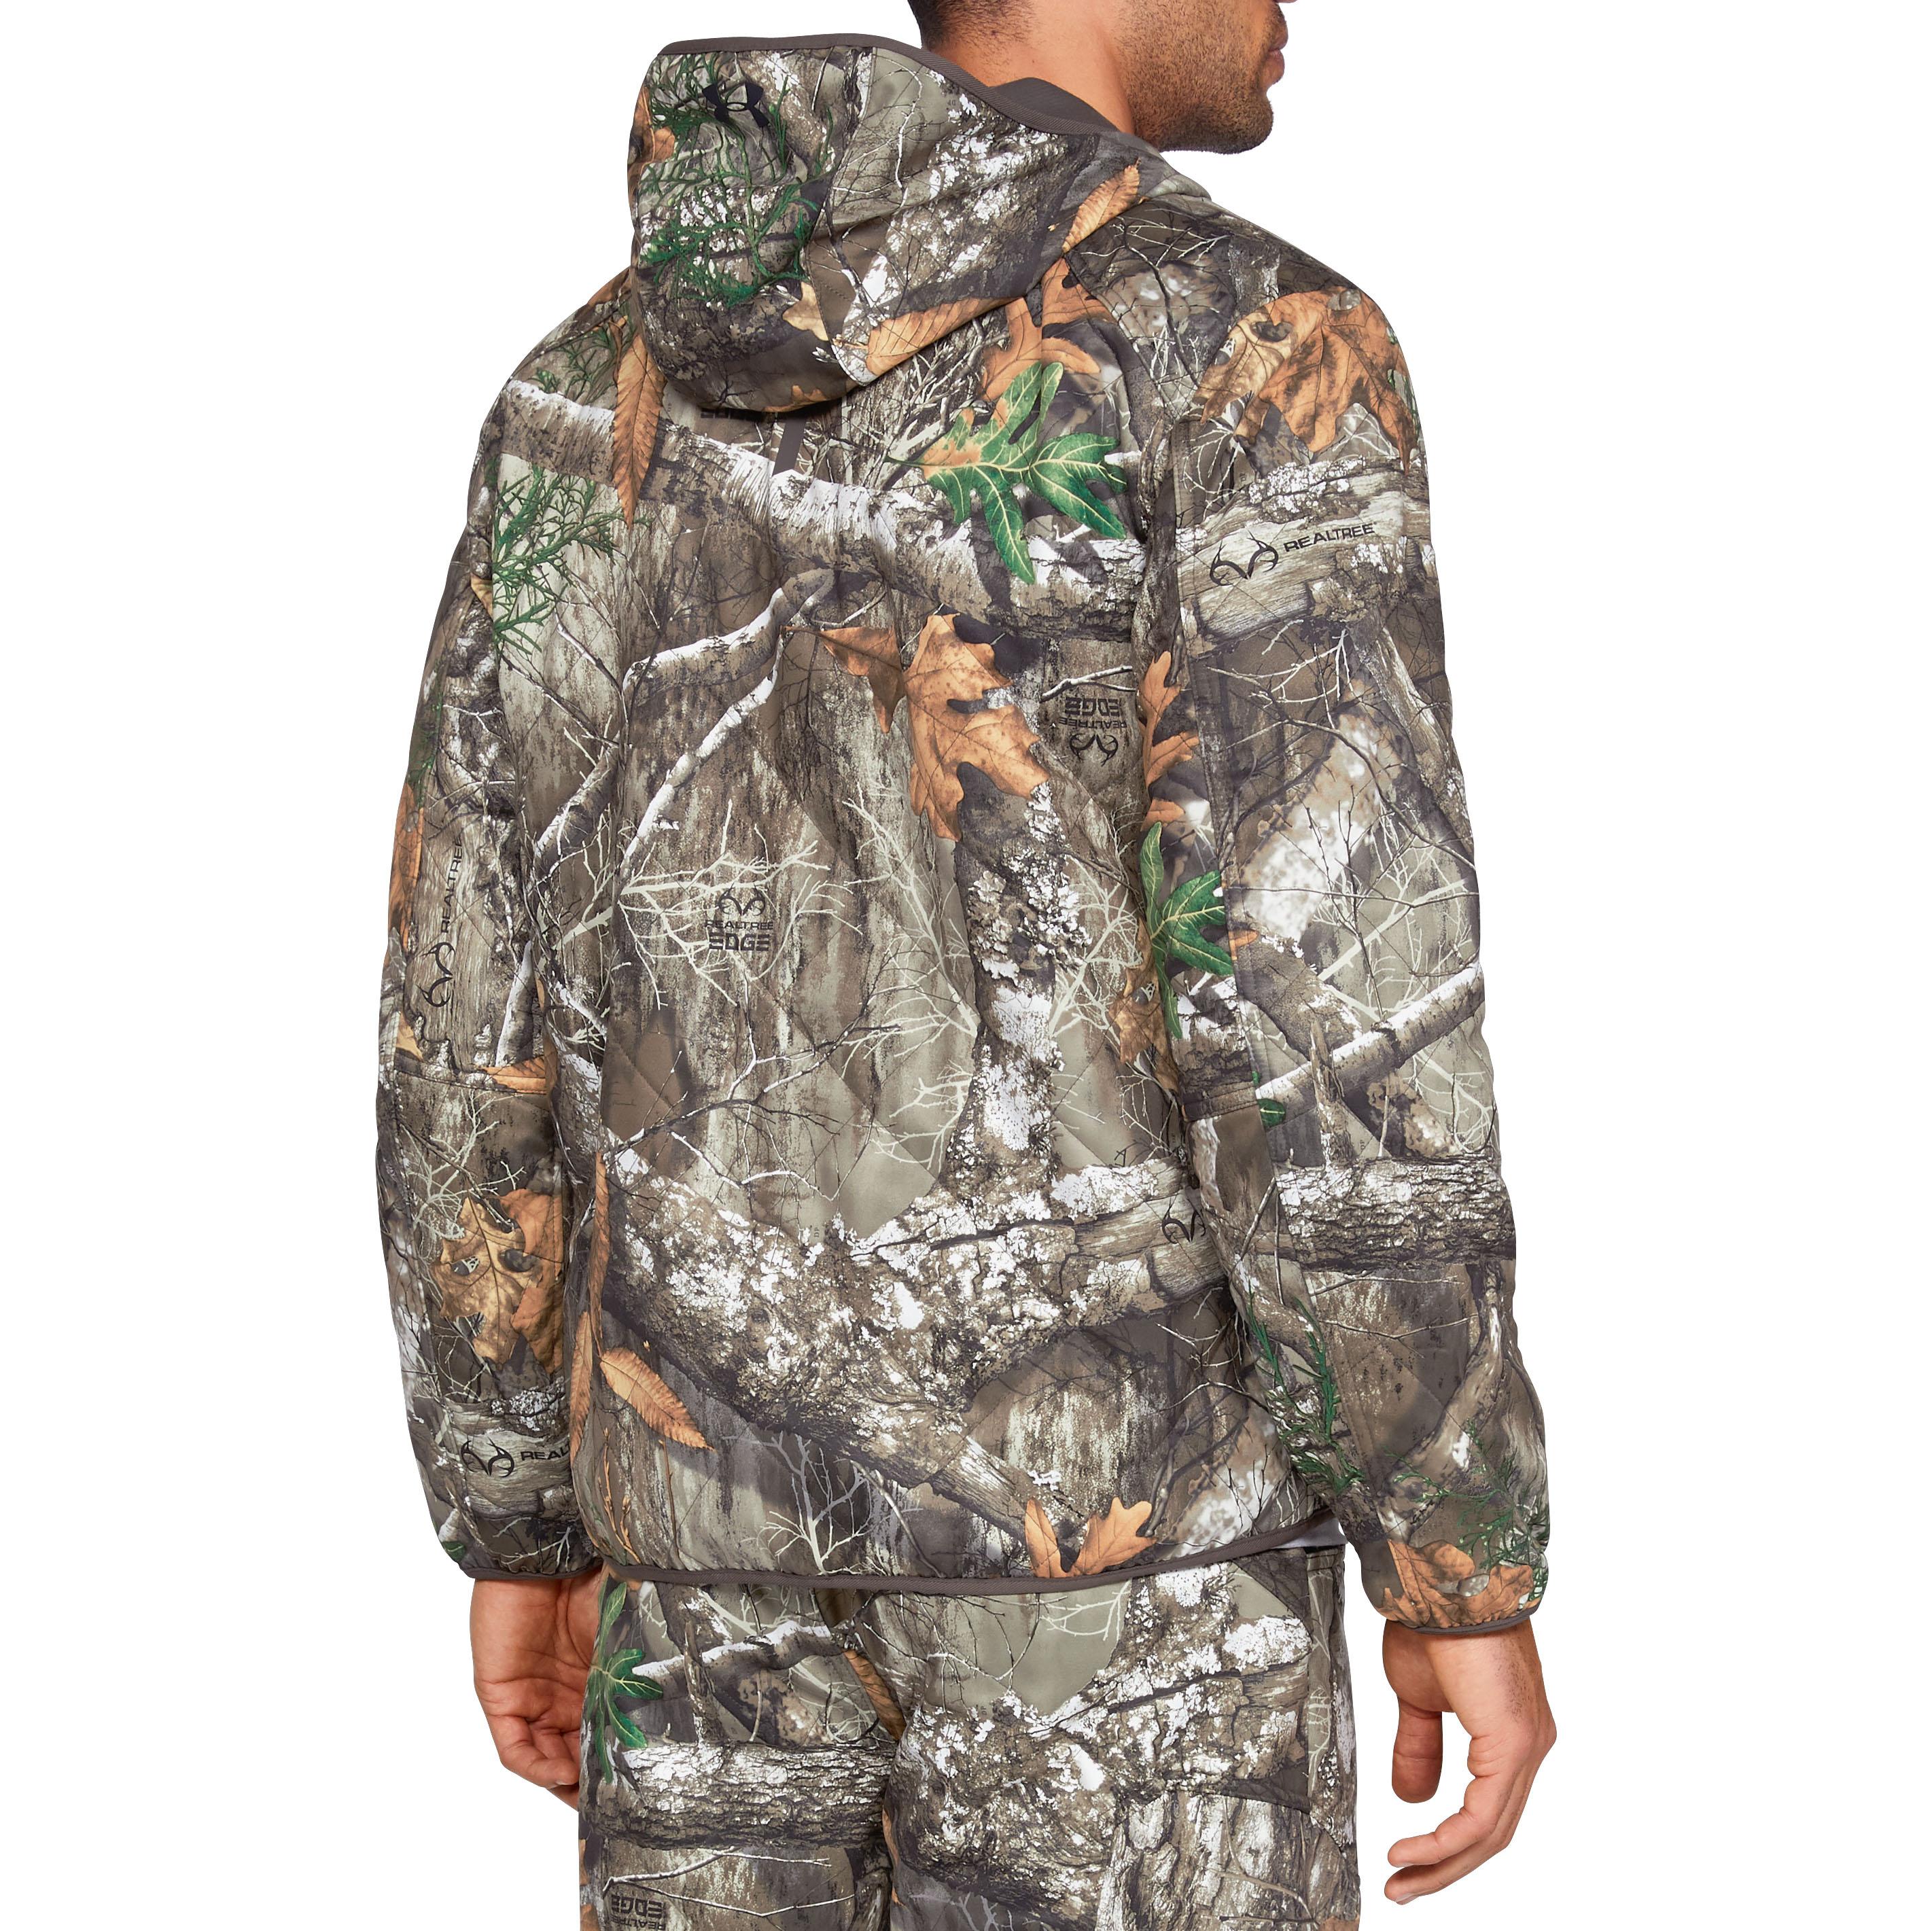 4e31abc0 Under Armour - Men's UA Brow Tine Hunting Jacket - Murdoch's